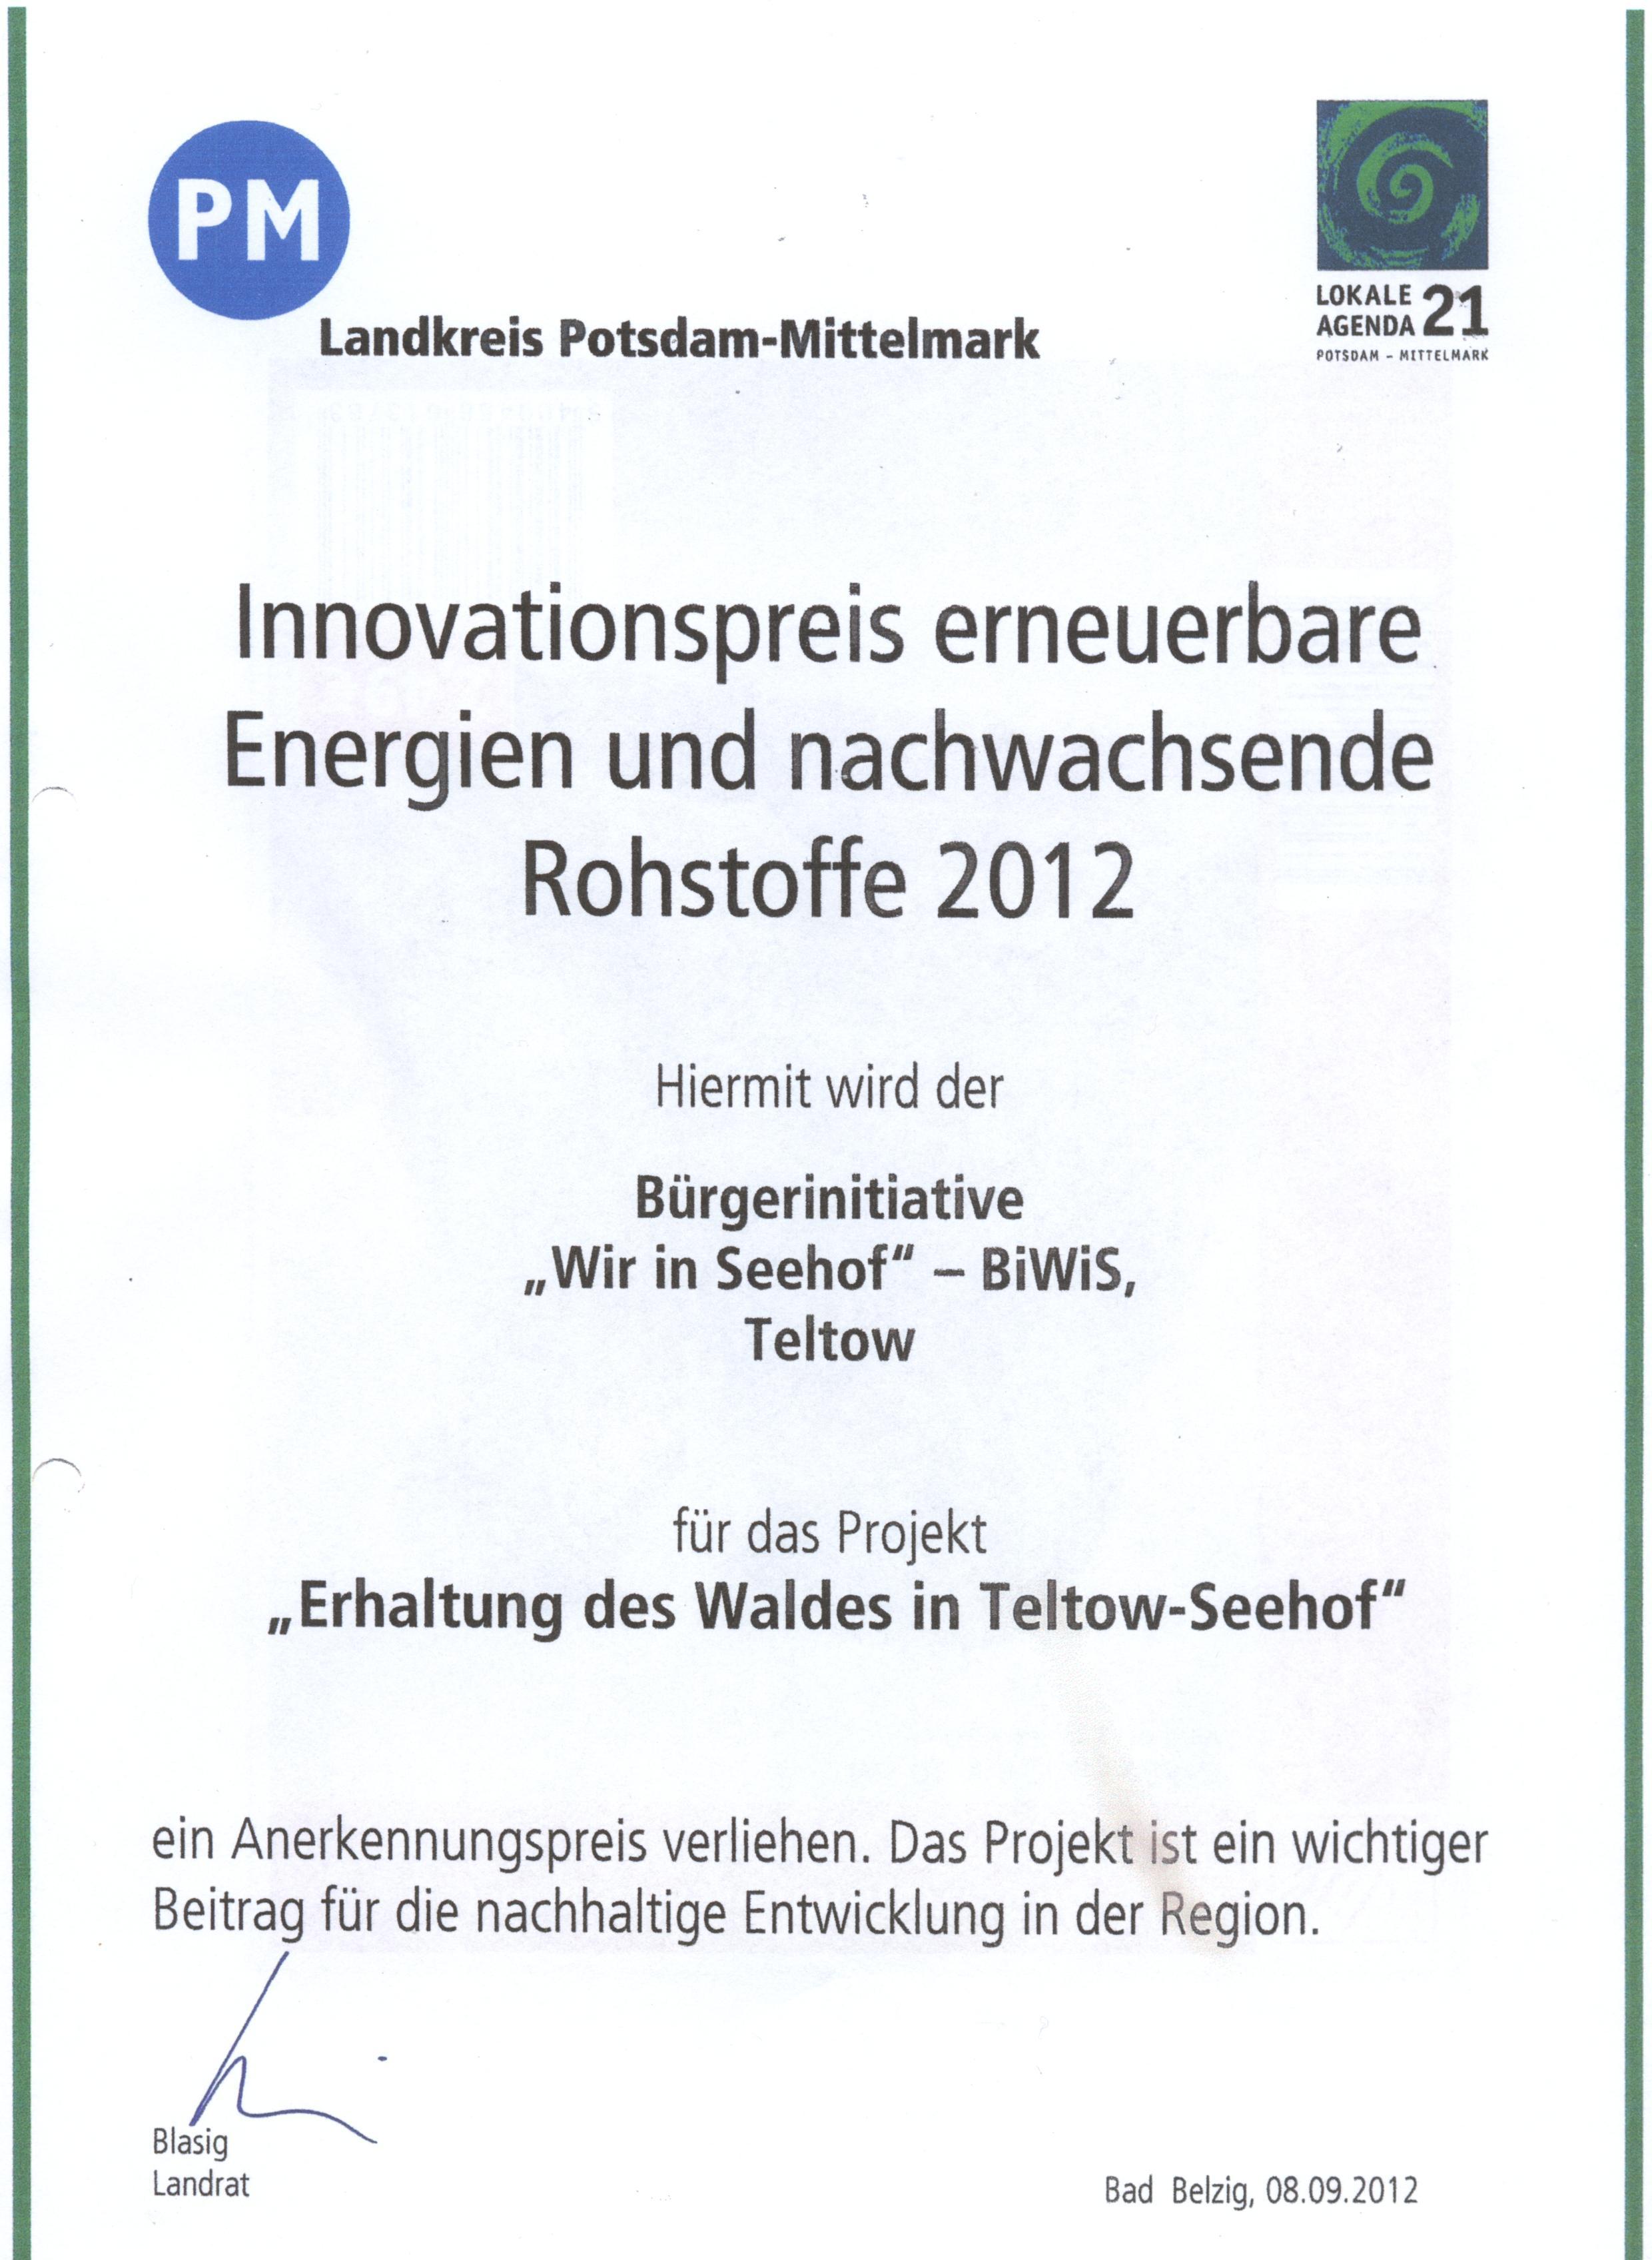 Innovationspreis des Landkreises Potsdam Mittelmark !